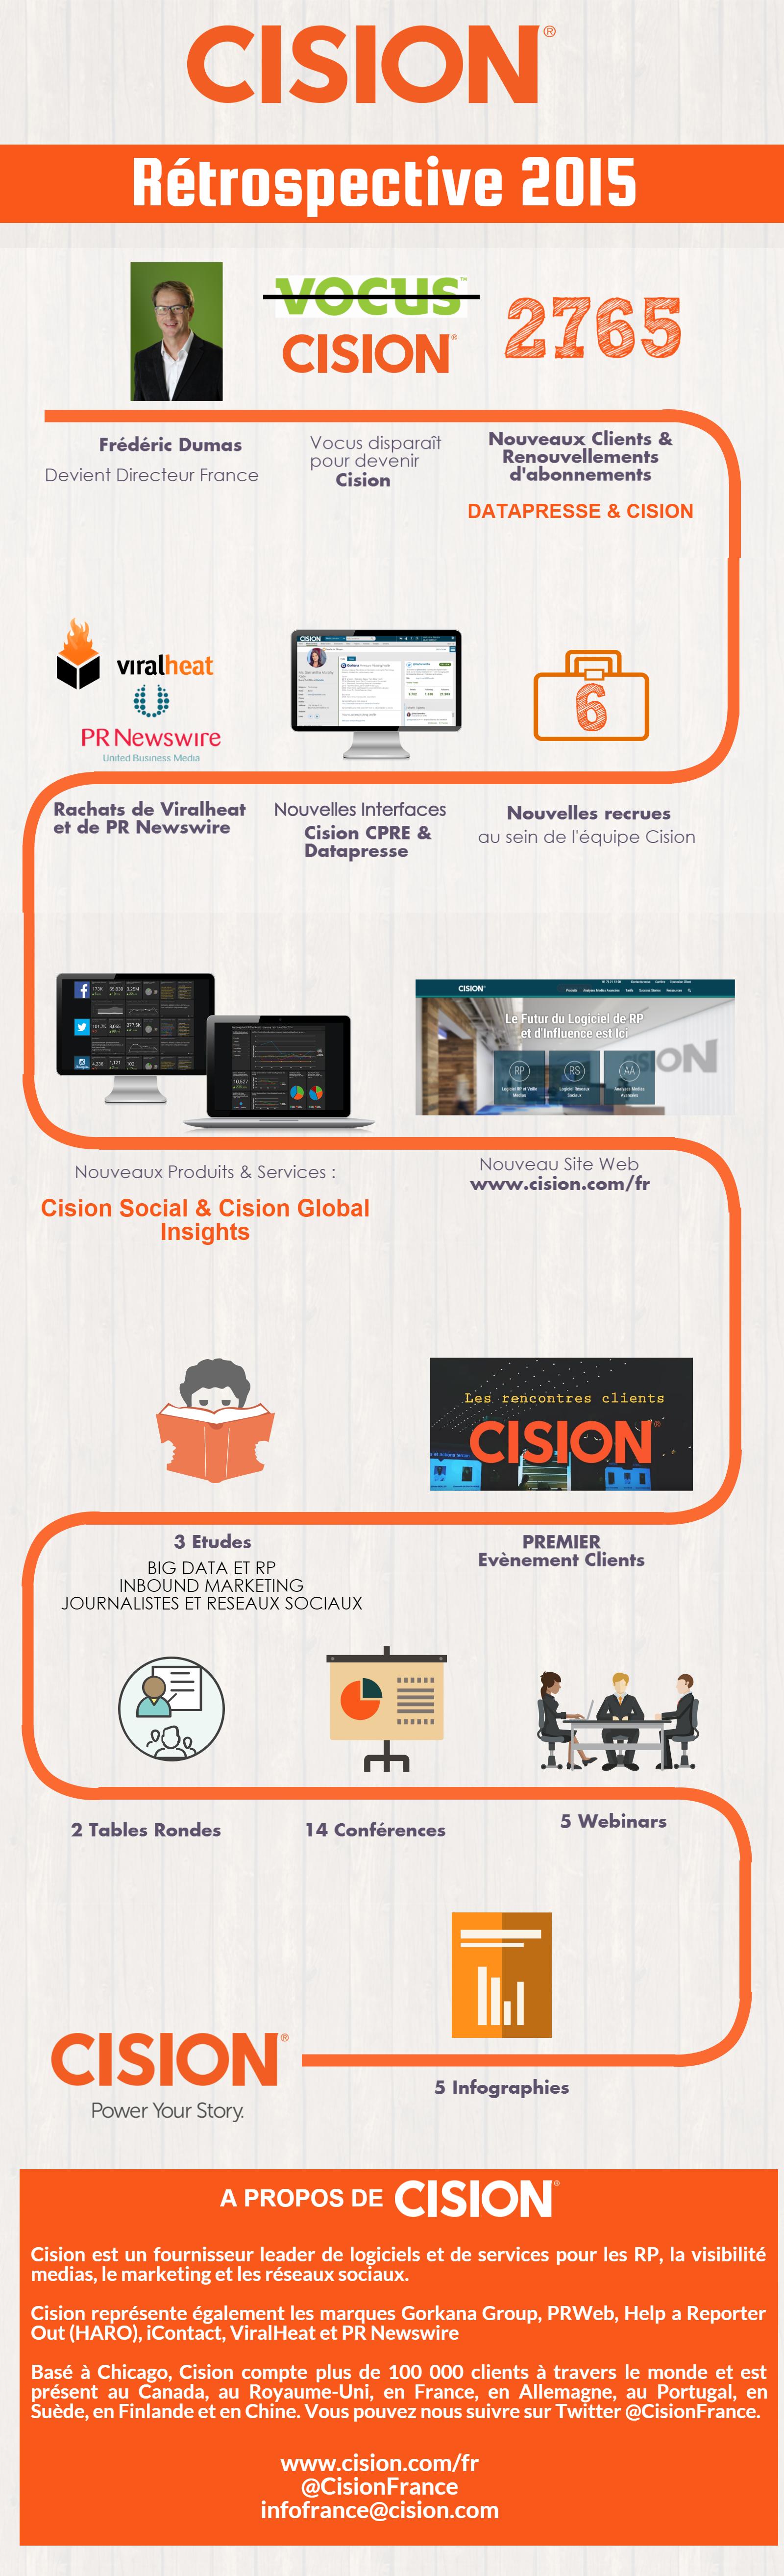 cision 2015